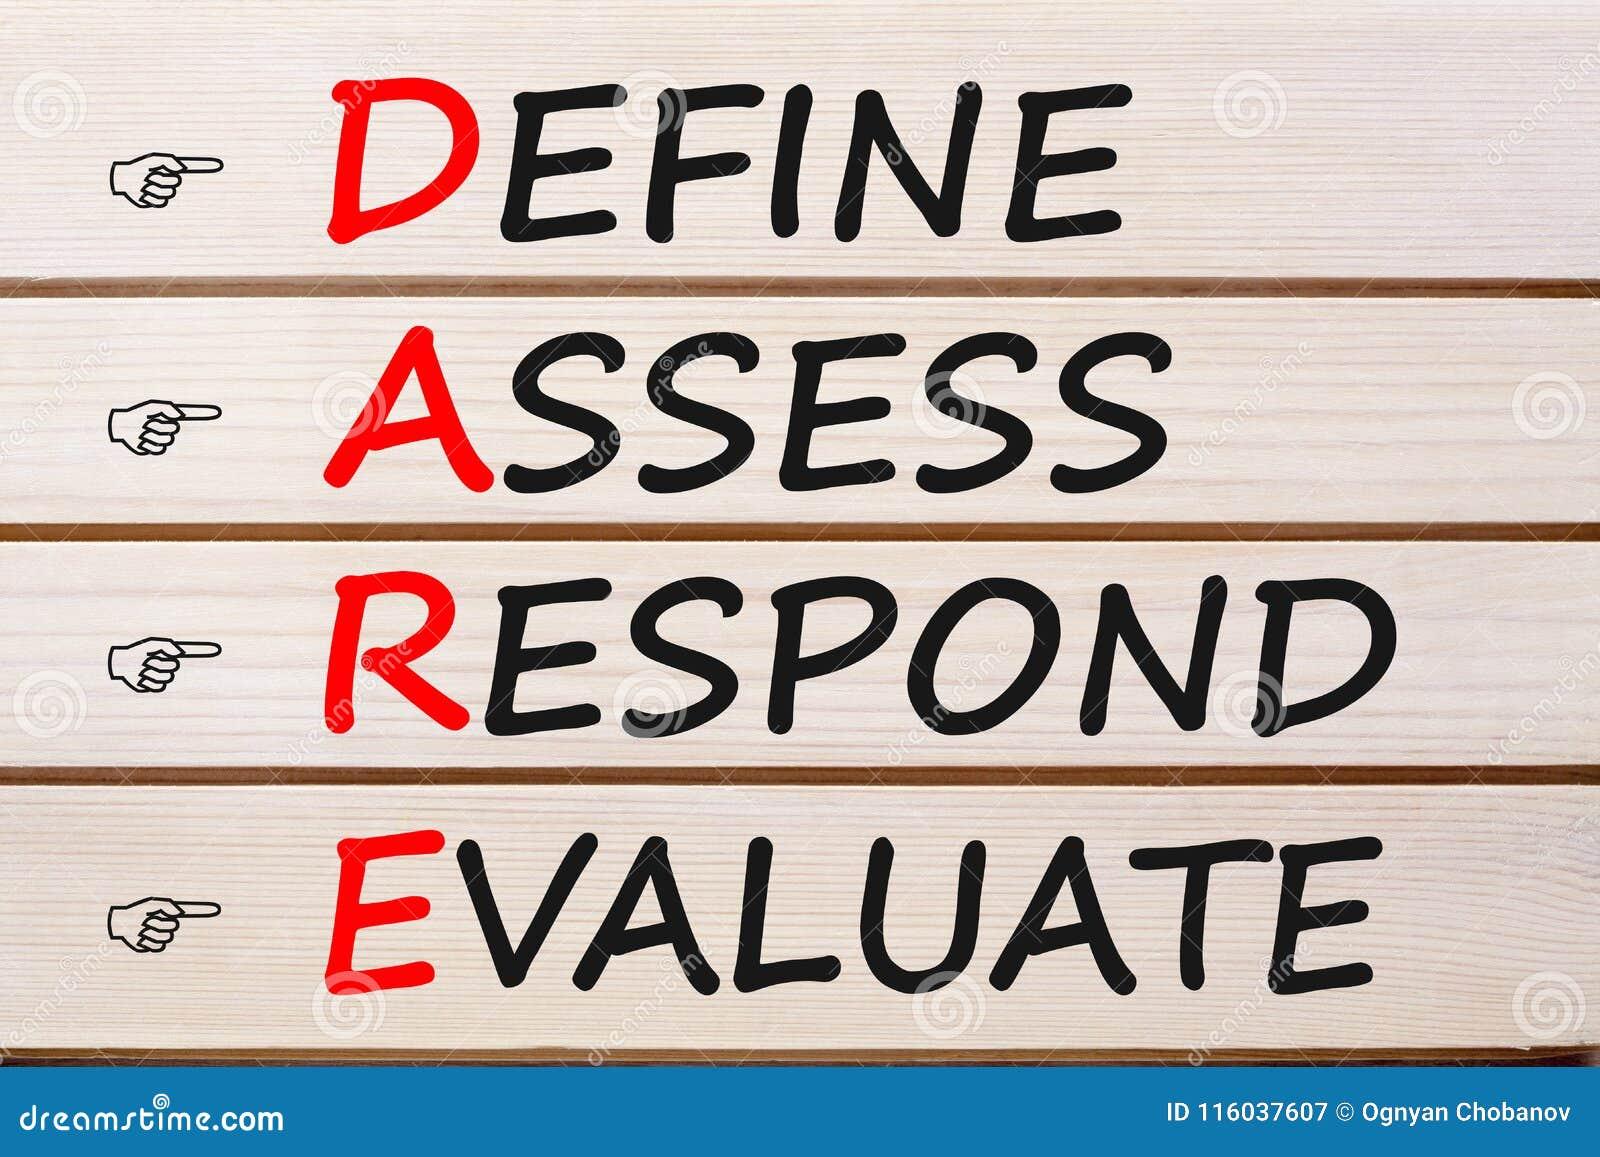 Define Assess Respond Evaluate DARE